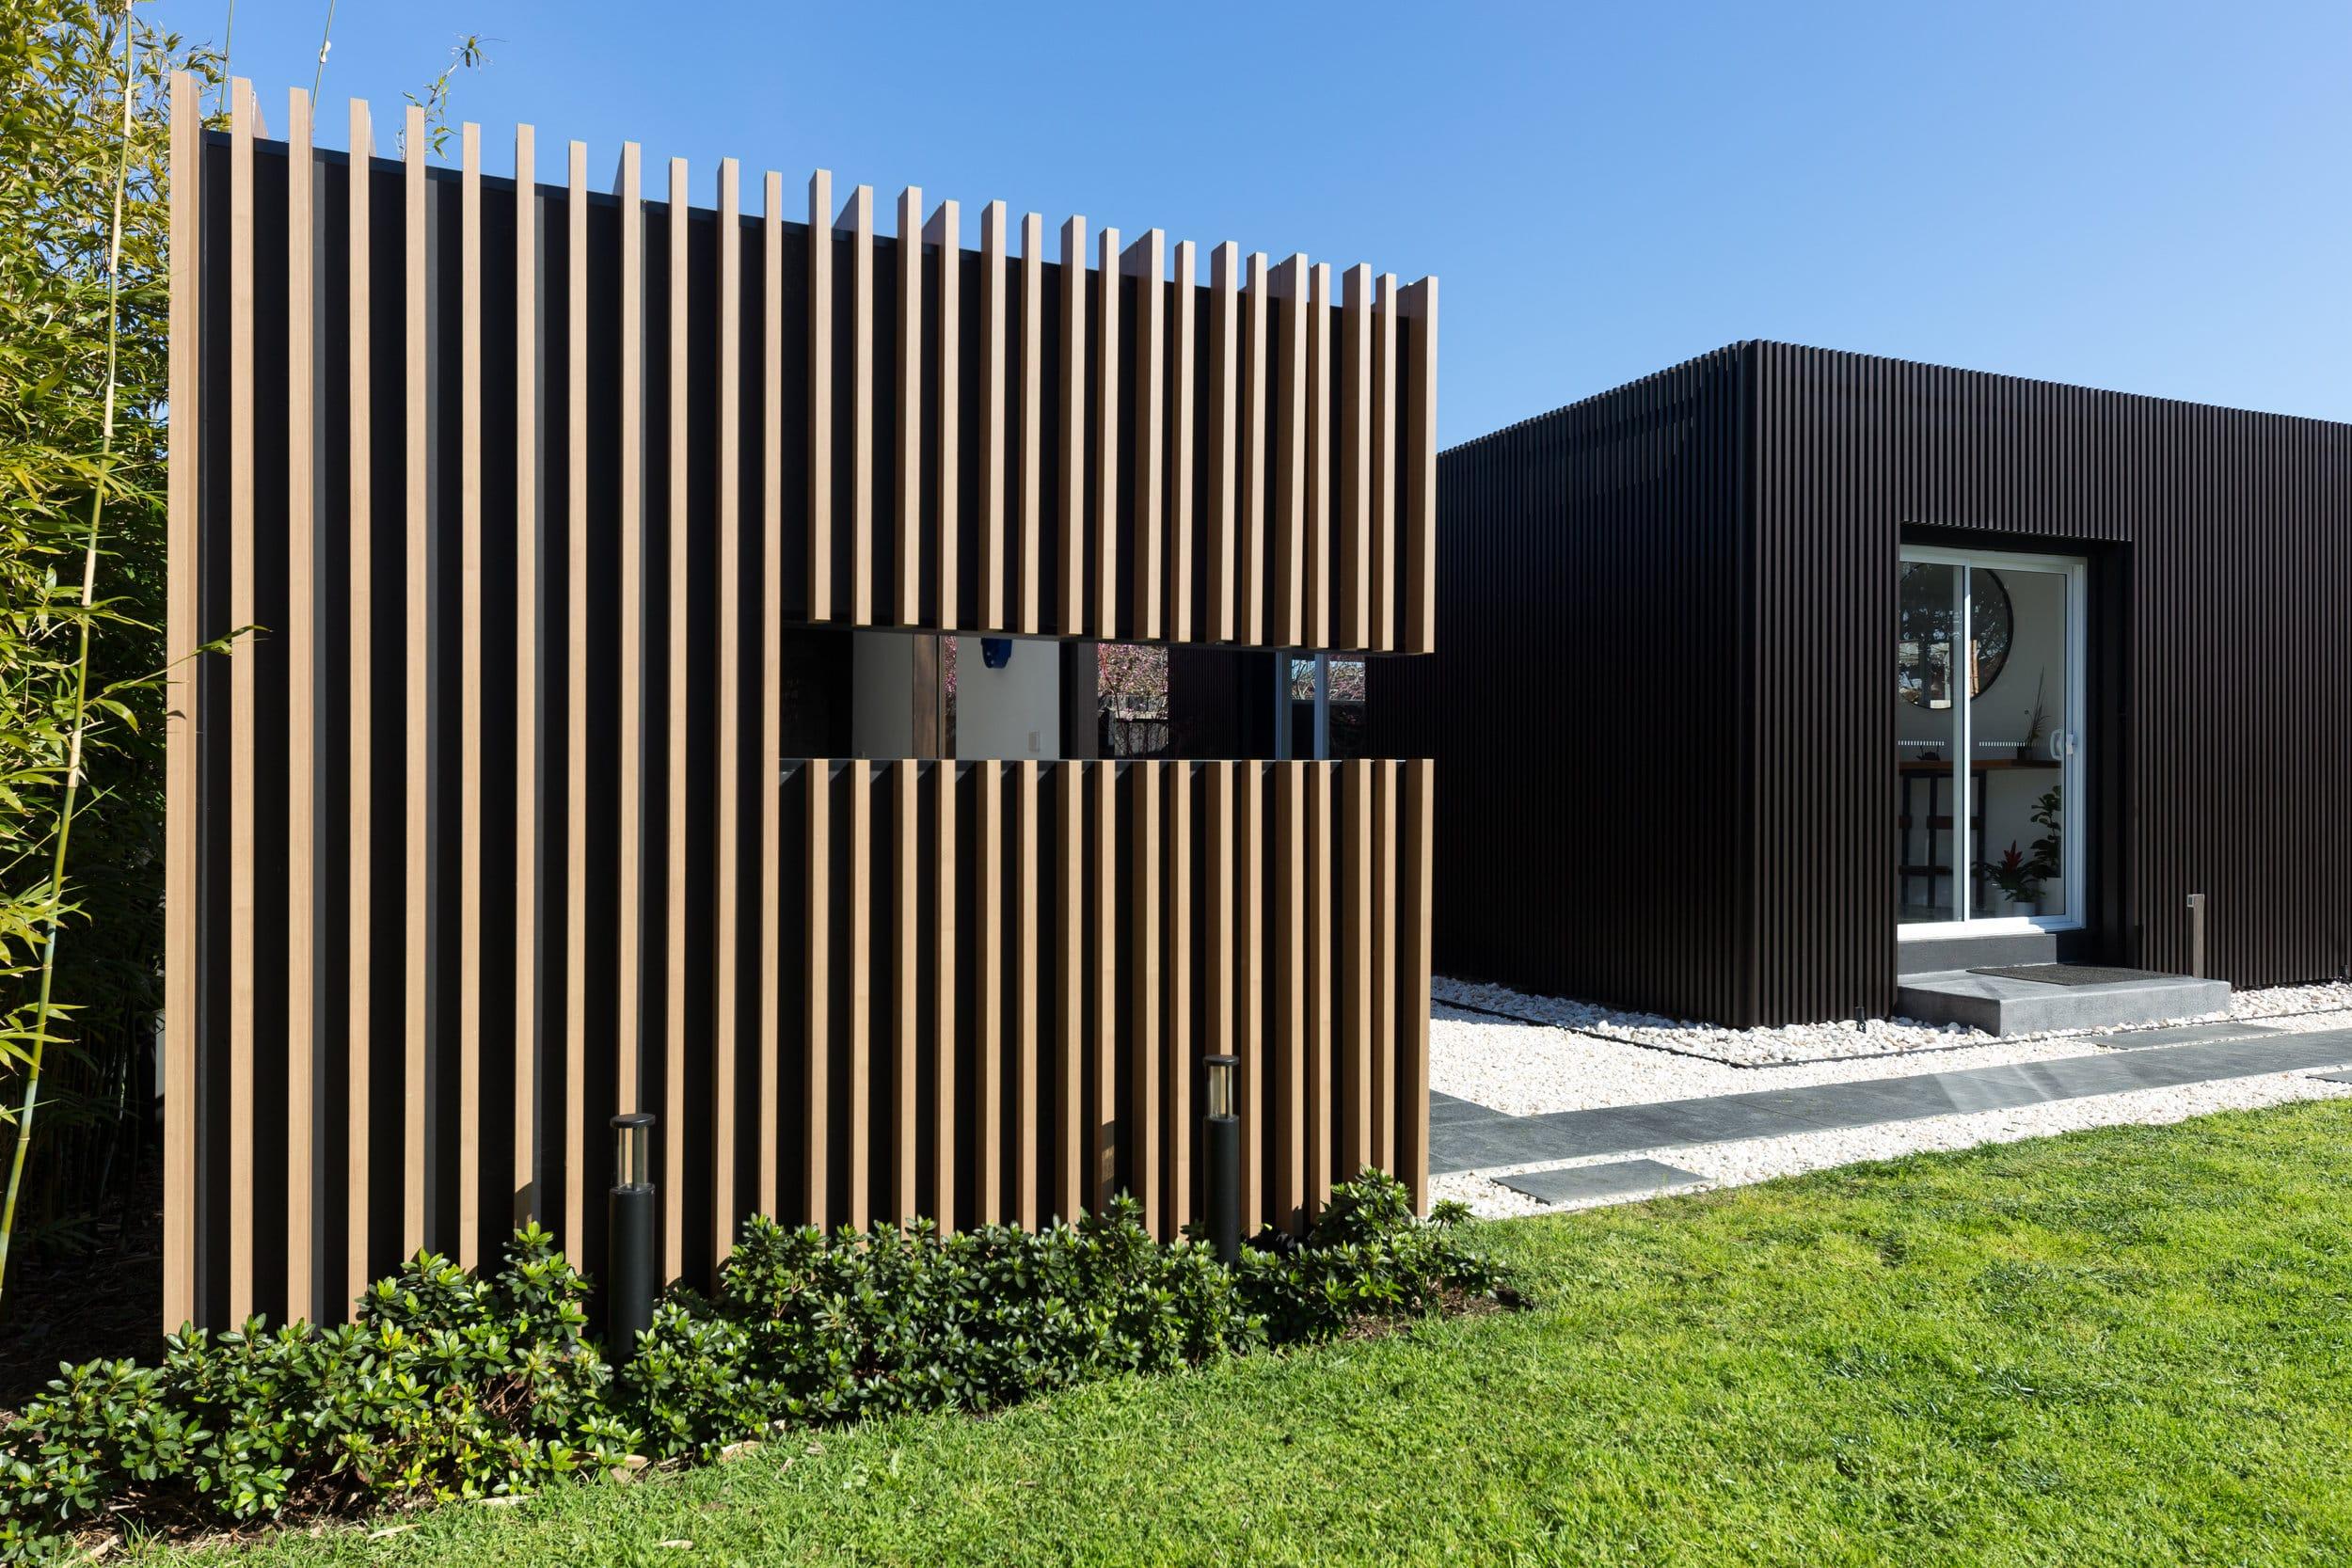 Covet Showroom - Altona VIC Ever Art Wood® battens - (L) Kabebari 30x50 & 30x85 in Kuri Masame; (R) Mizotsuki 30x50 in Burakku Suchi-ru